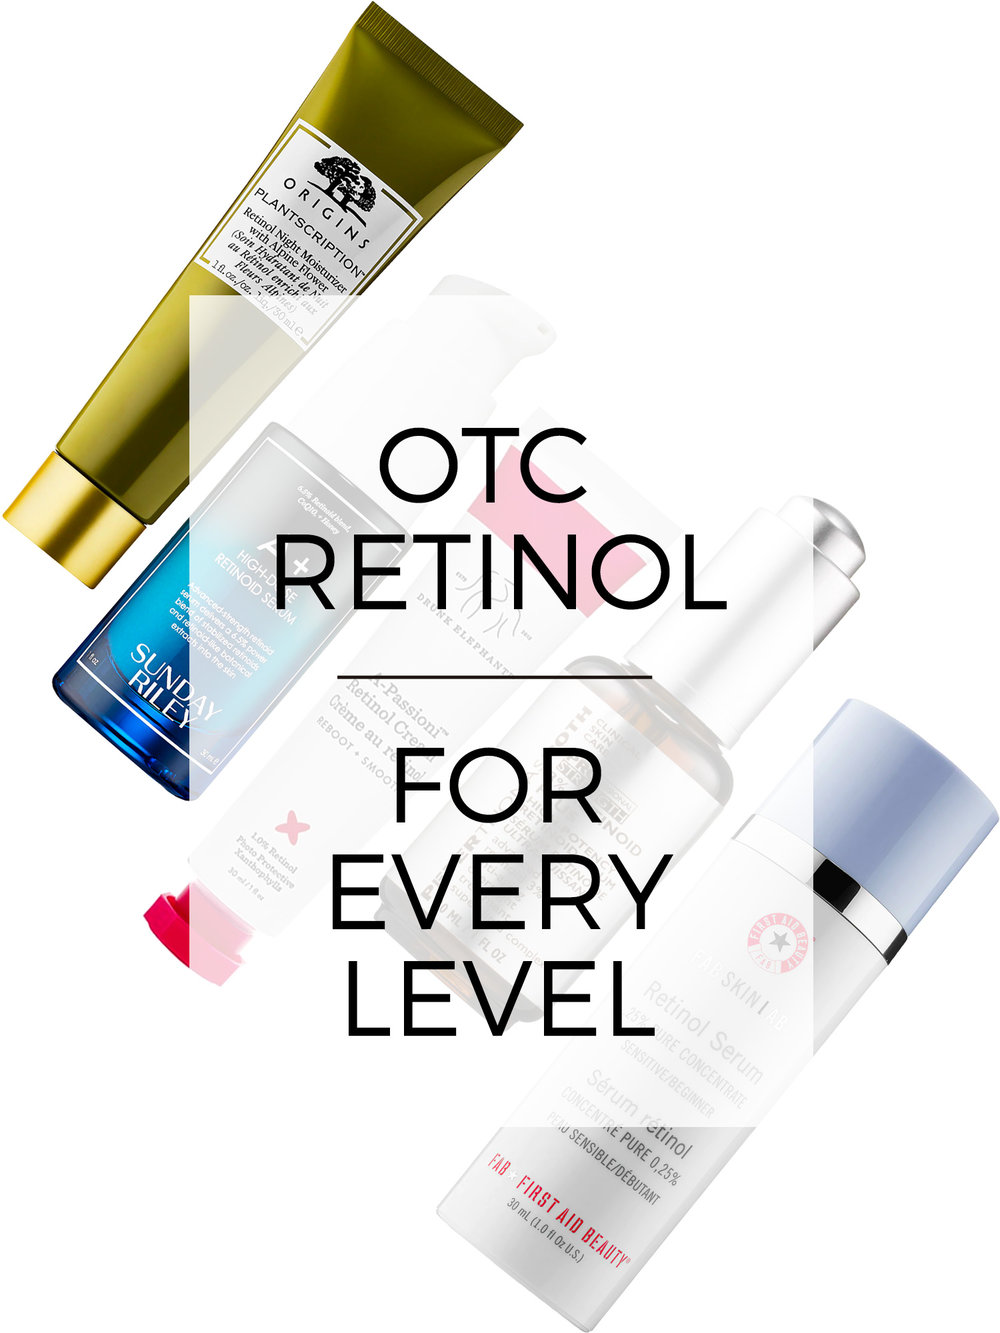 Retinol FAQ and 5 OTC Recommendations